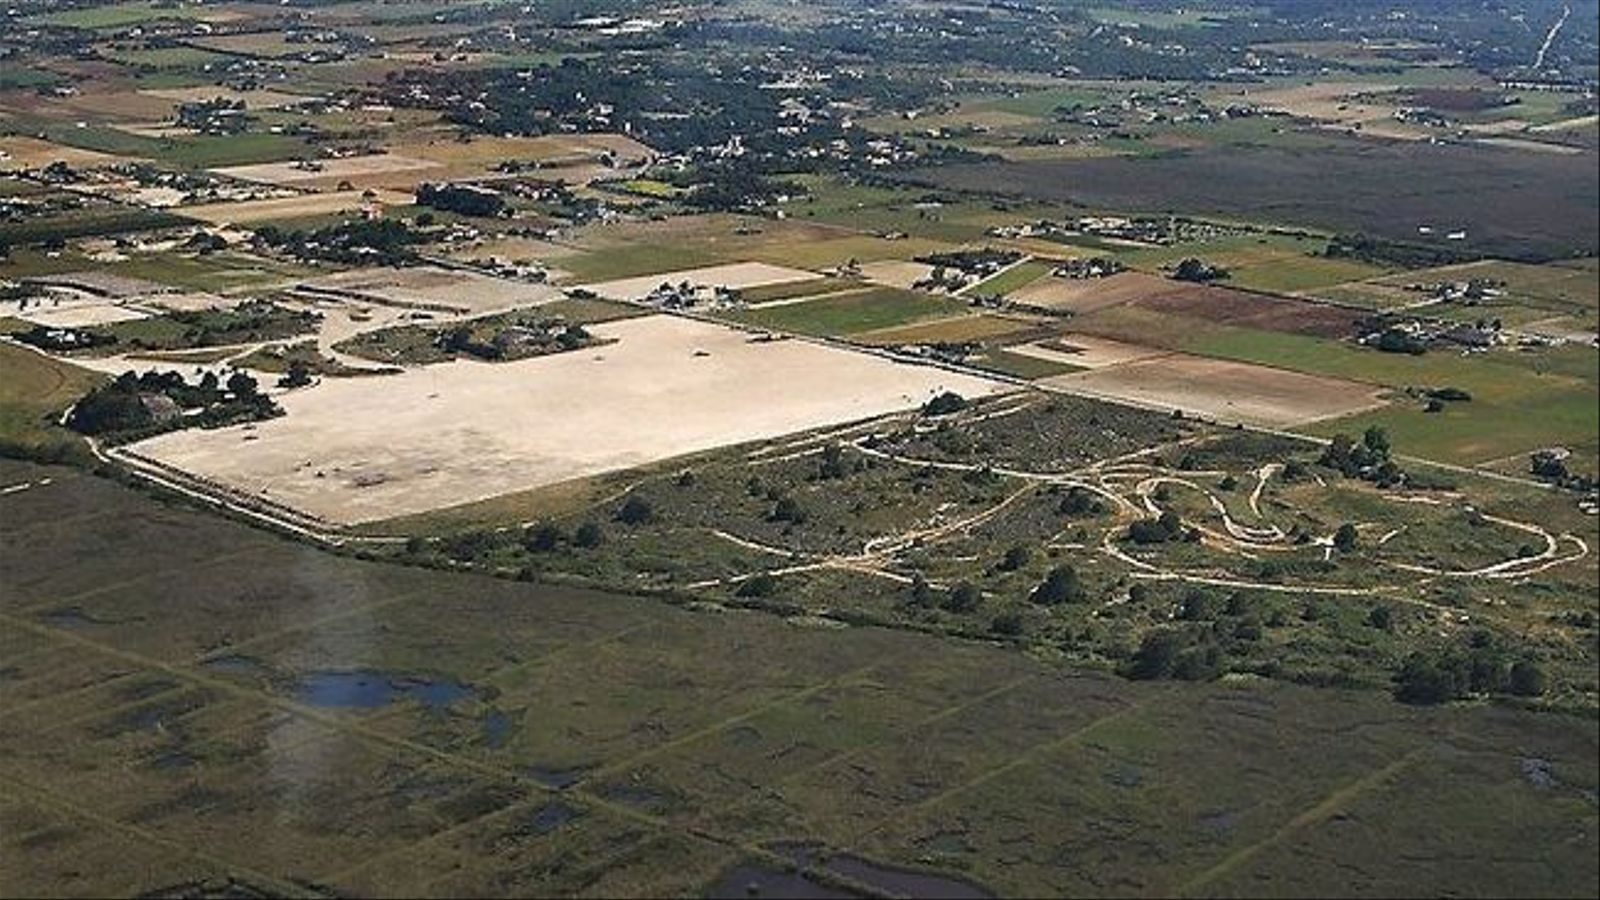 Vista aèria dels terrenys de Son Bosc, on es pretenia construir un camp de golf.